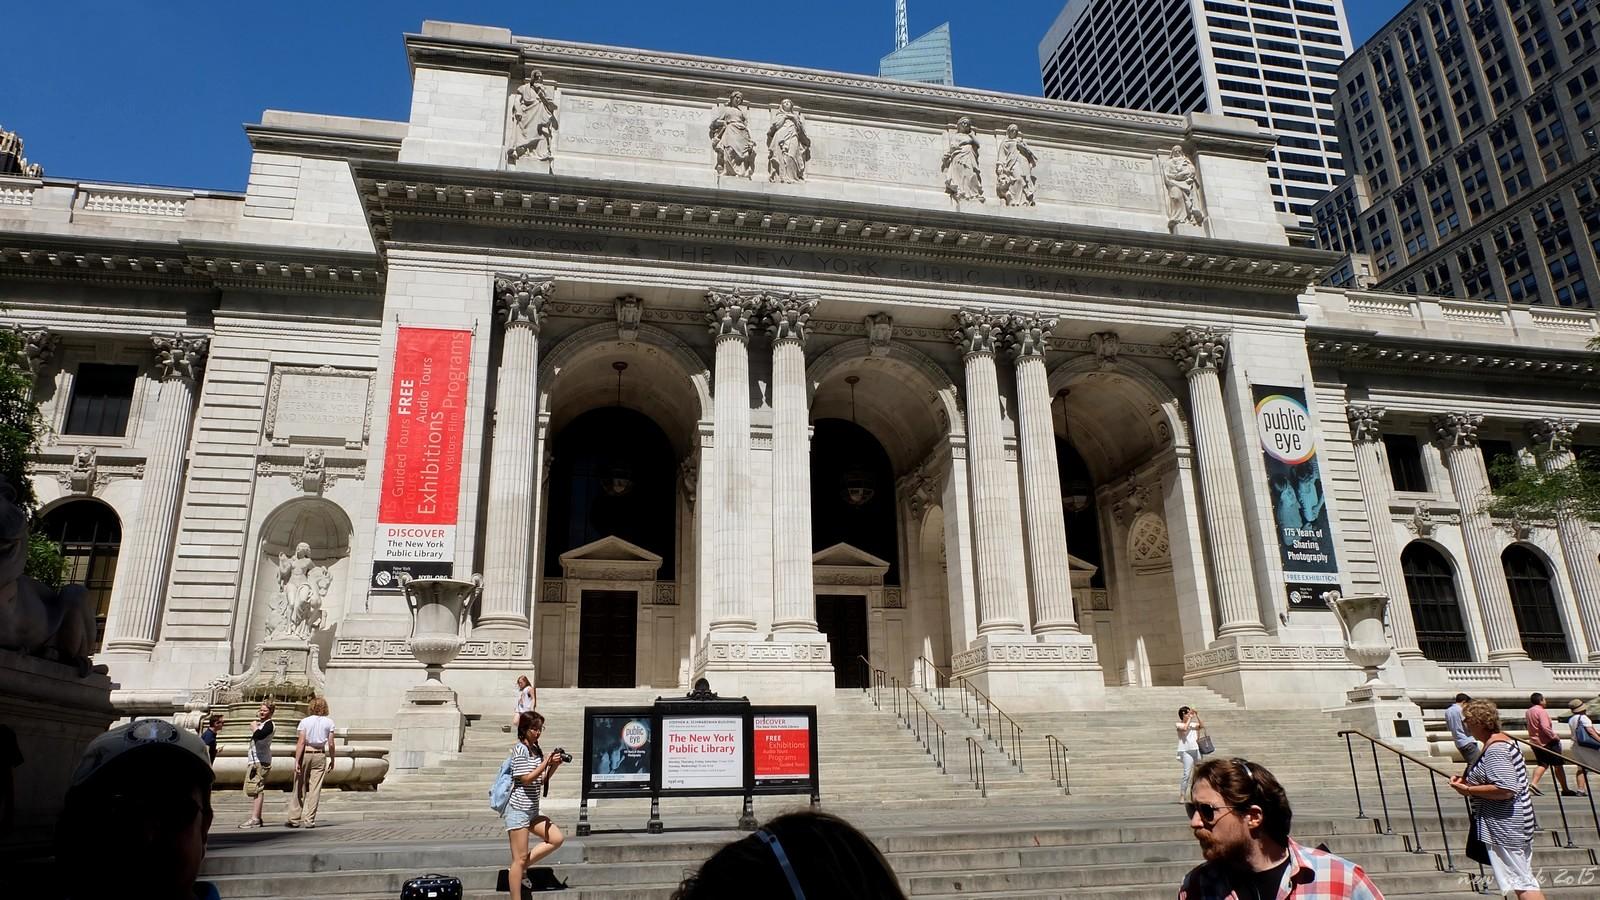 Public Library, New York City, USA